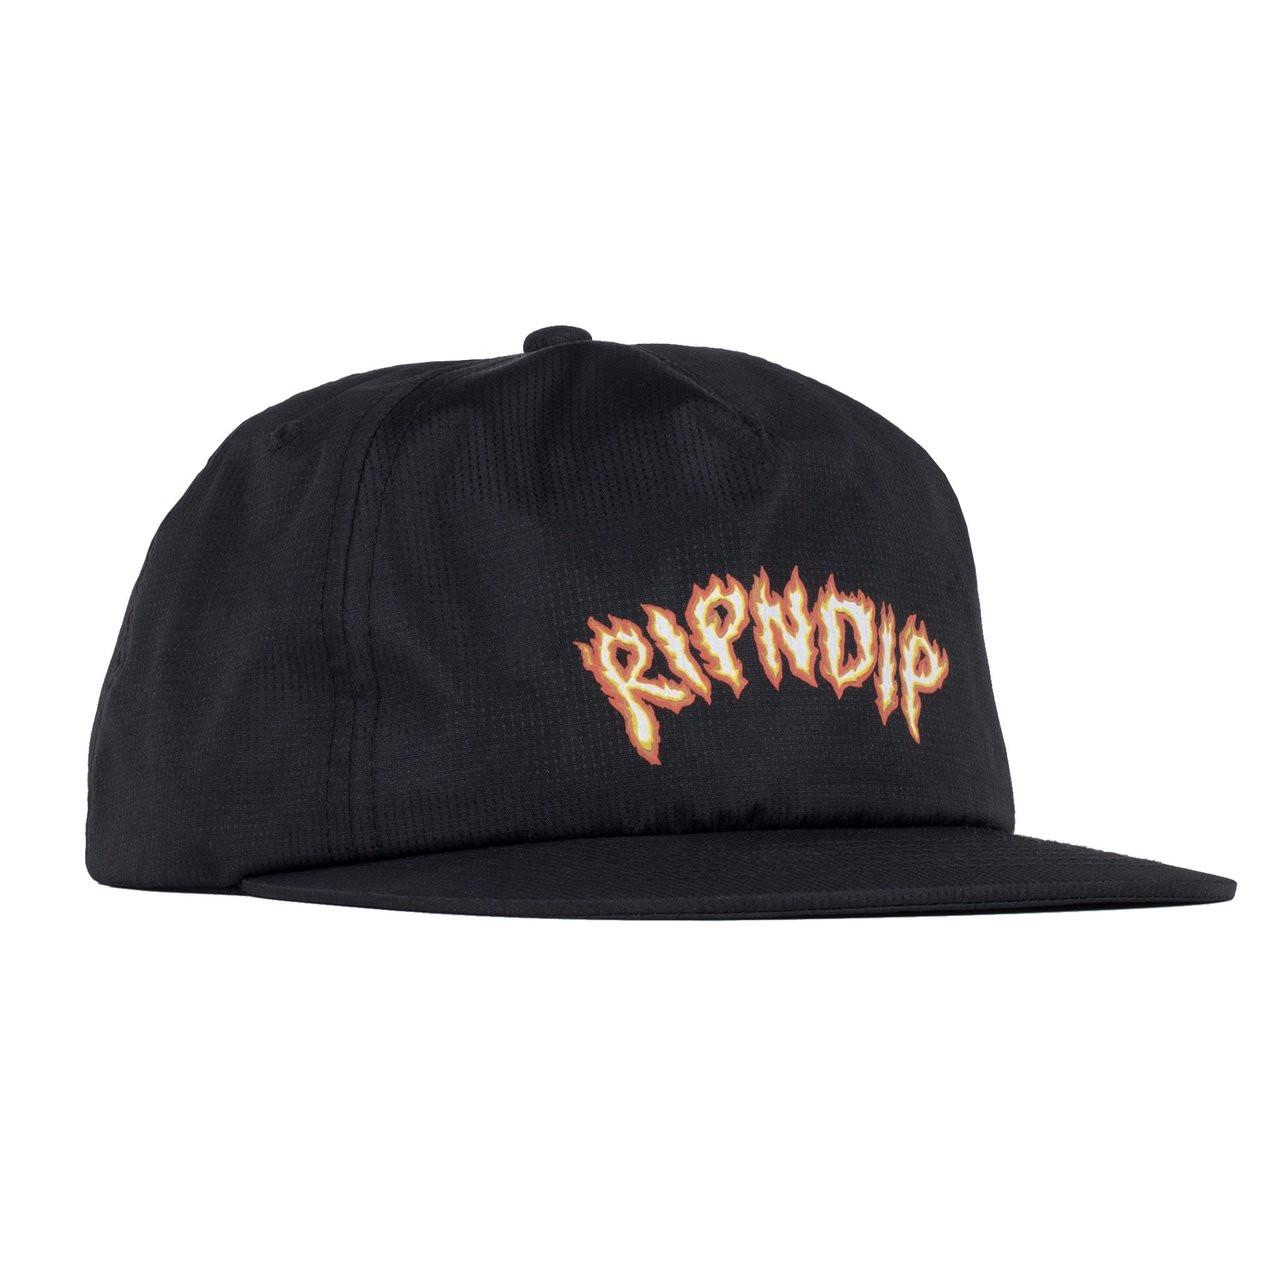 c47246ecc75 RIPNDIP Inferno Snapback Hat - Black